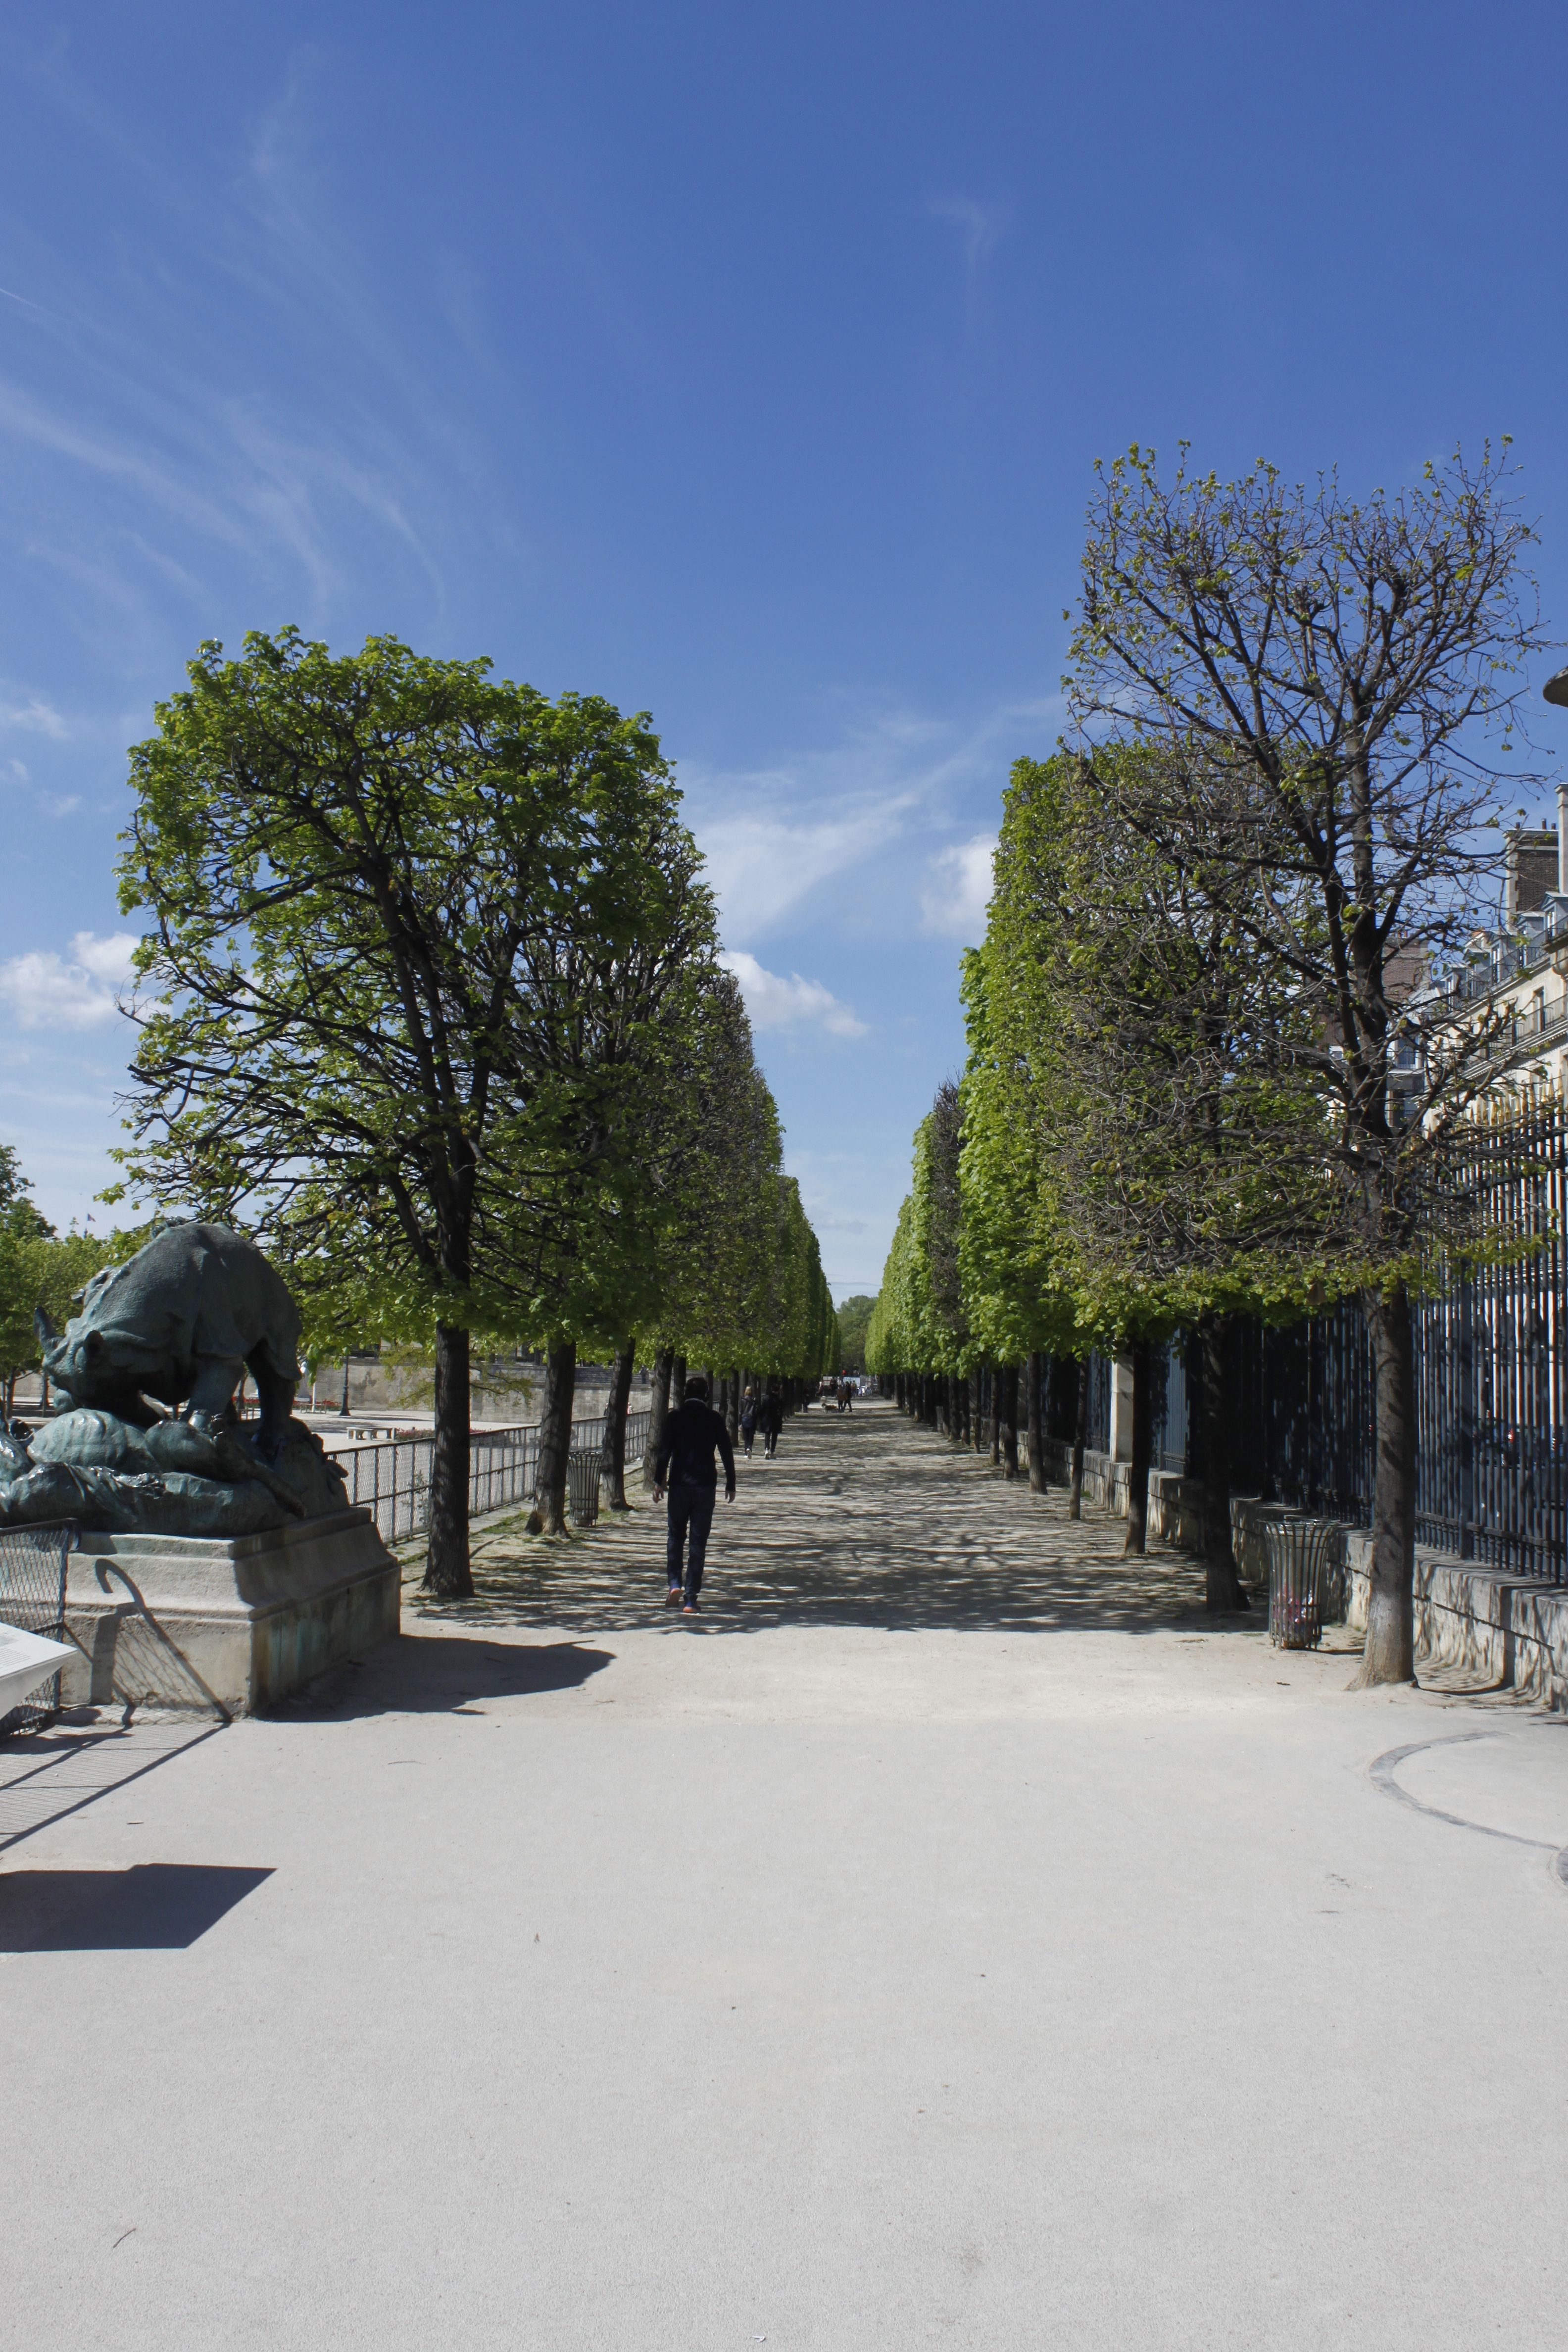 These amazing trees!